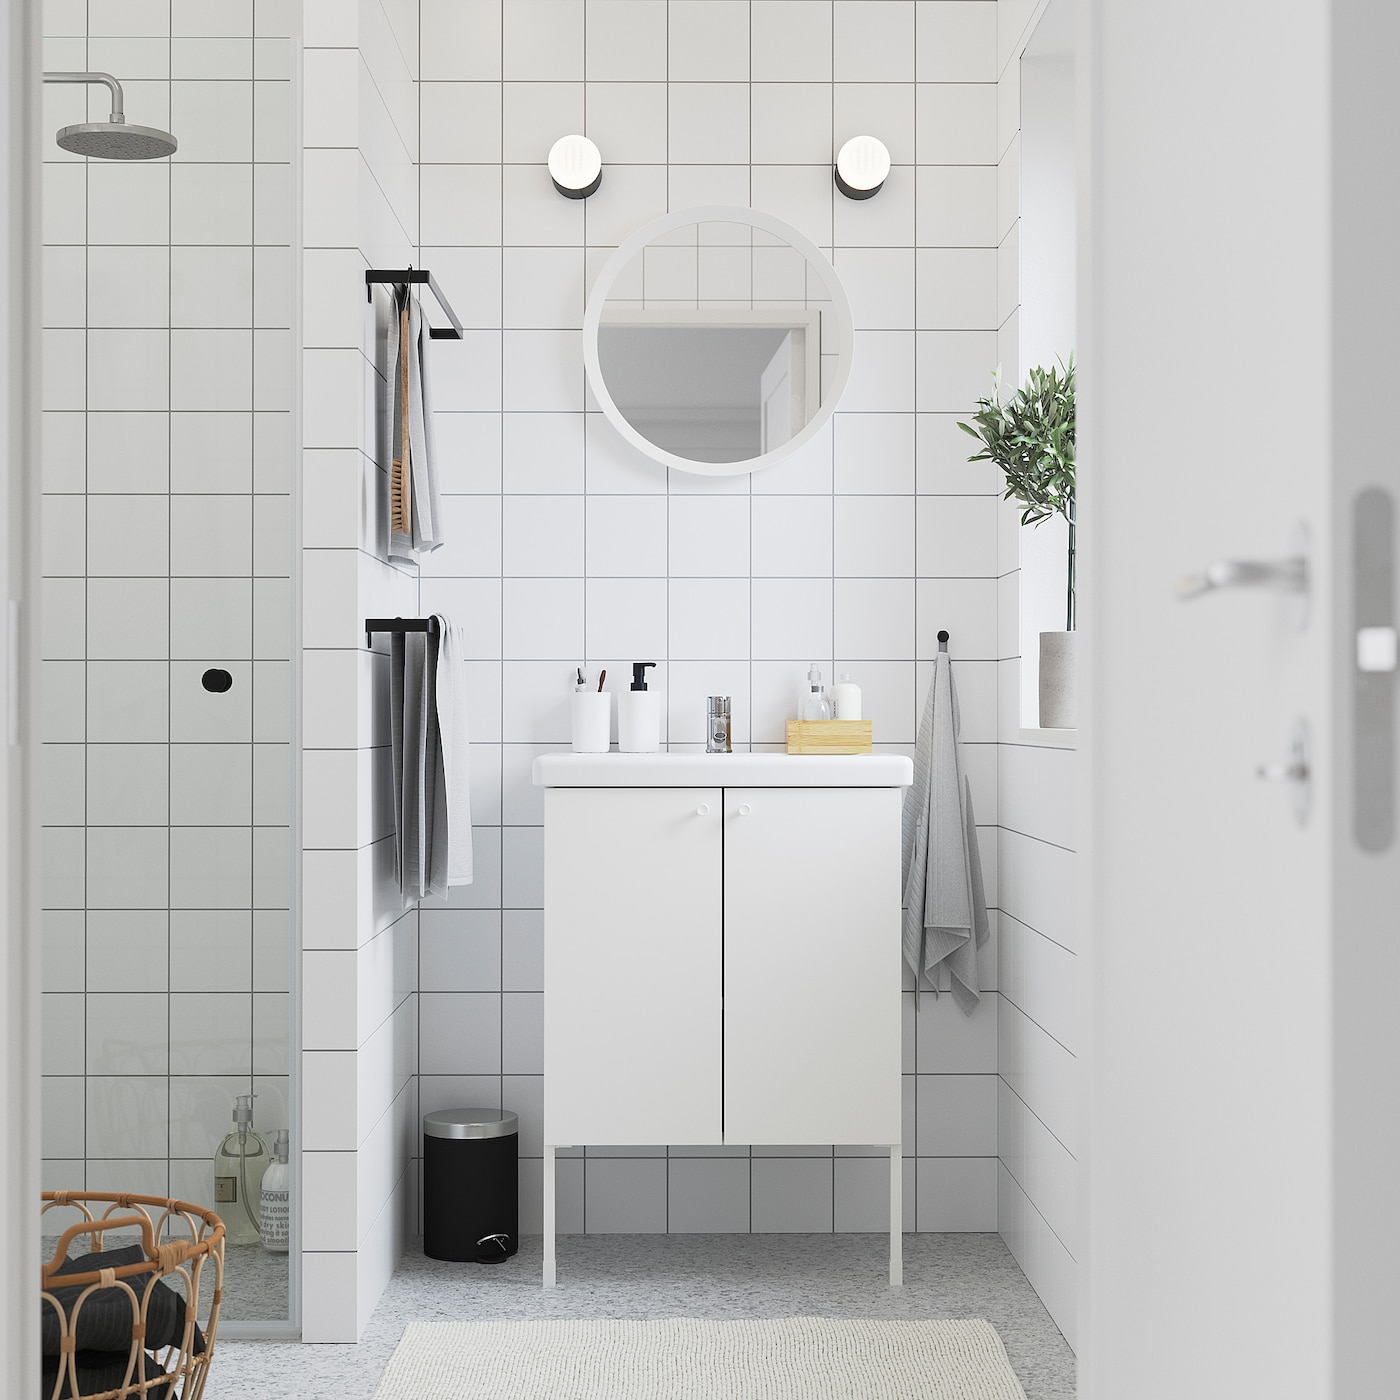 ENHET / TVÄLLEN Element za umivaonik,2 vrata, bela/PILKÅN slavina, 64x43x87 cm